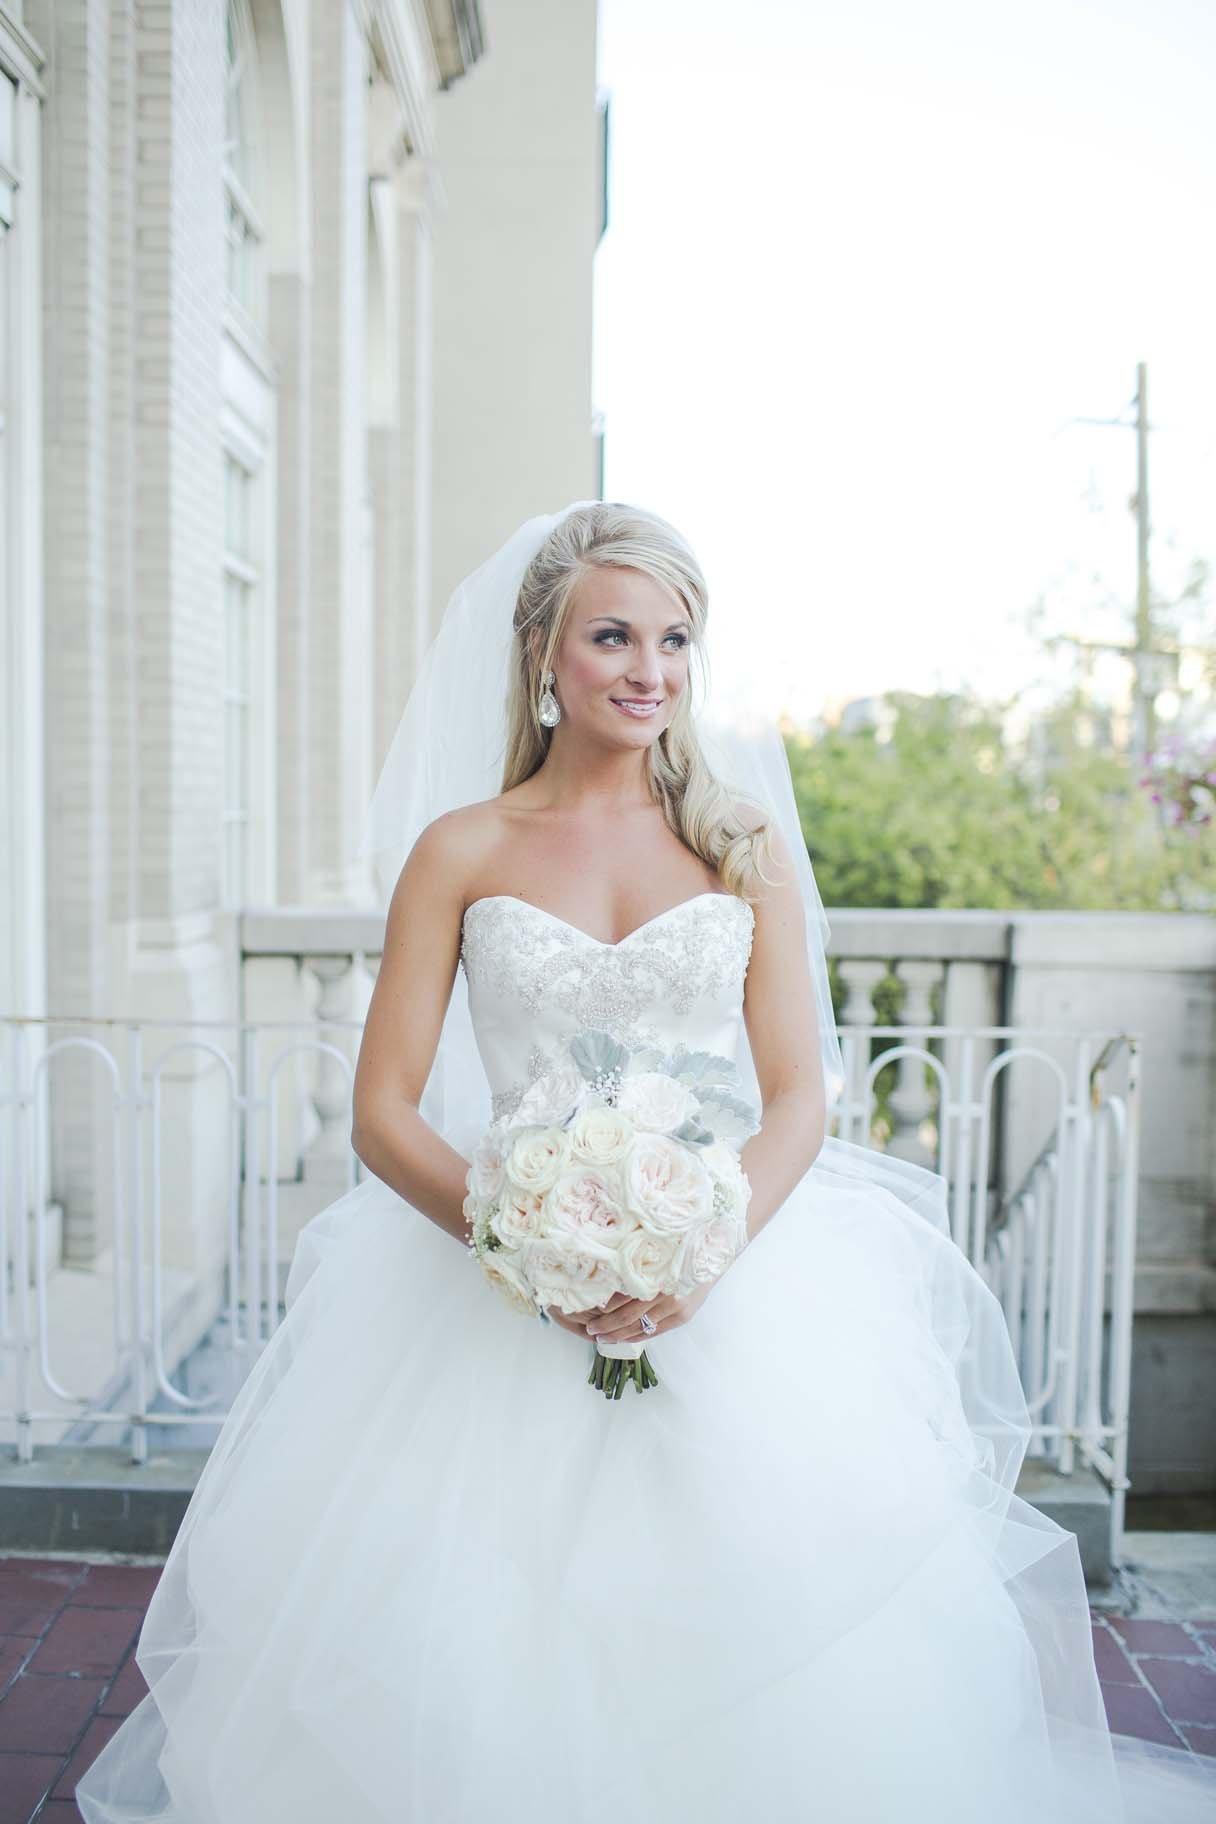 Atlanta Wedding Georgian Terrace 7 - Elizabeth Anne Designs: The ...